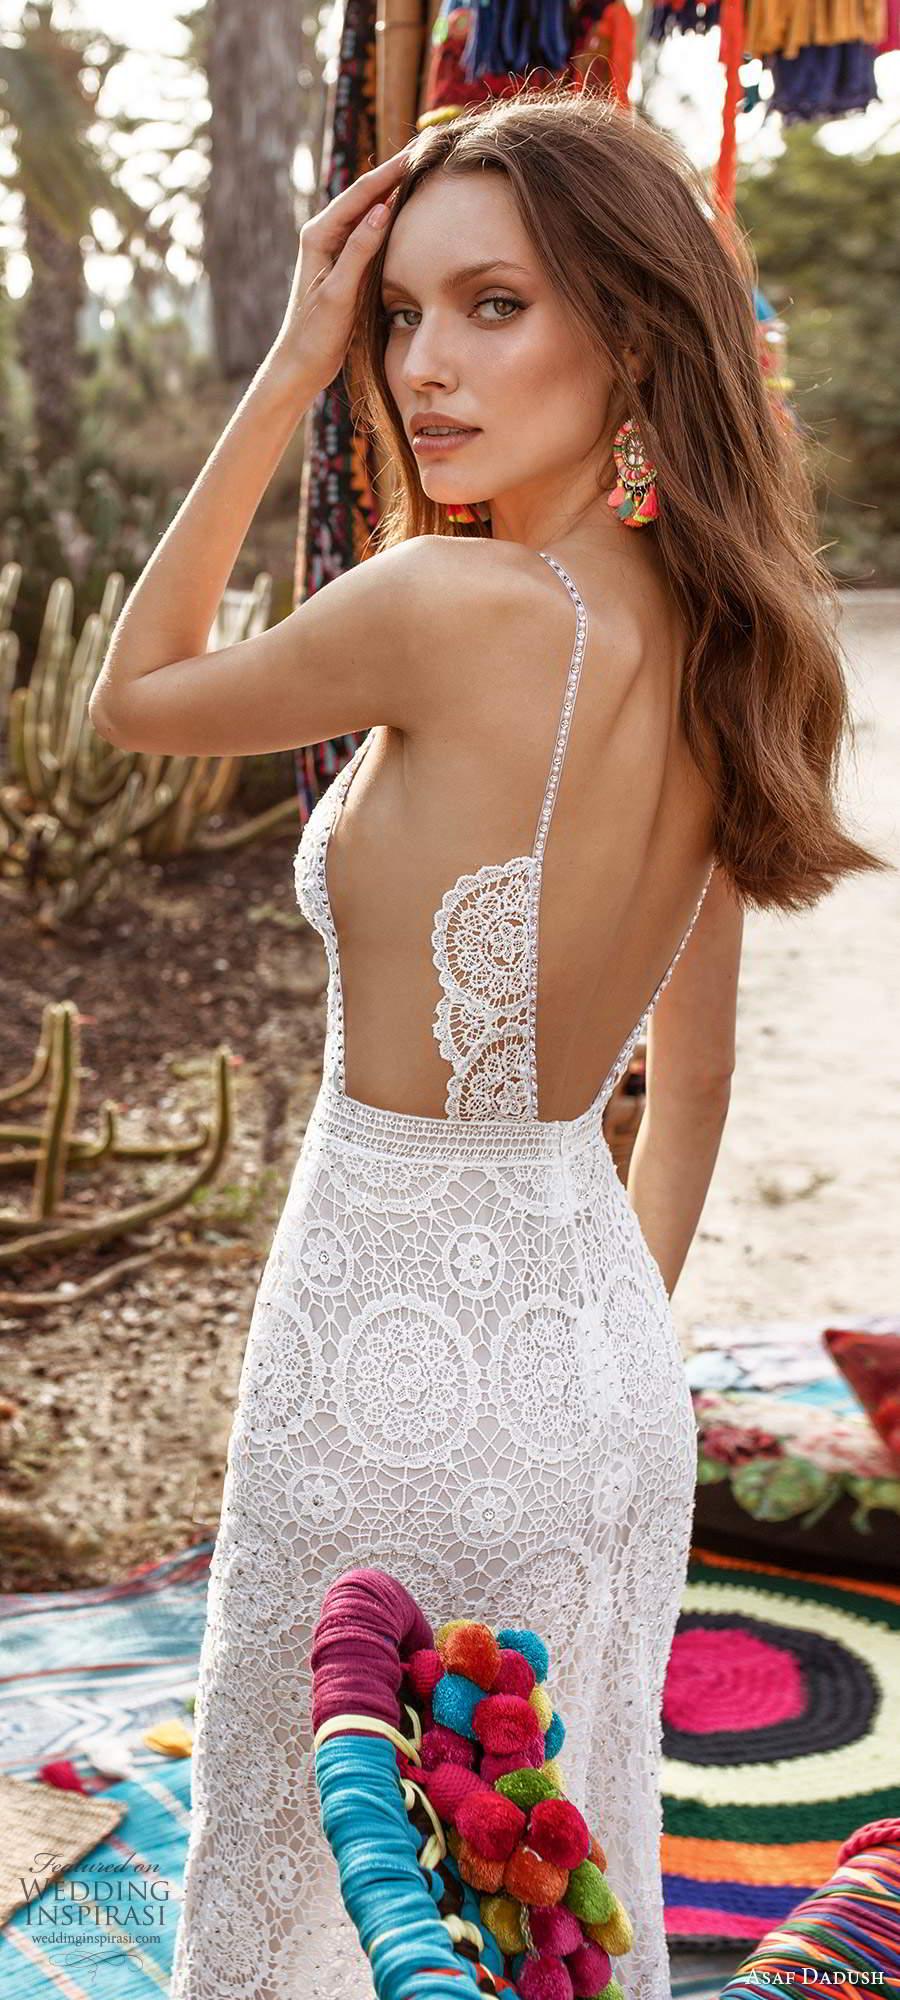 asaf dadush 2020 bridal sleeveless thin beaded straps plunging neckline fully embellished lace sheath side cutout a line wedding dress sheer open back (5) zbv